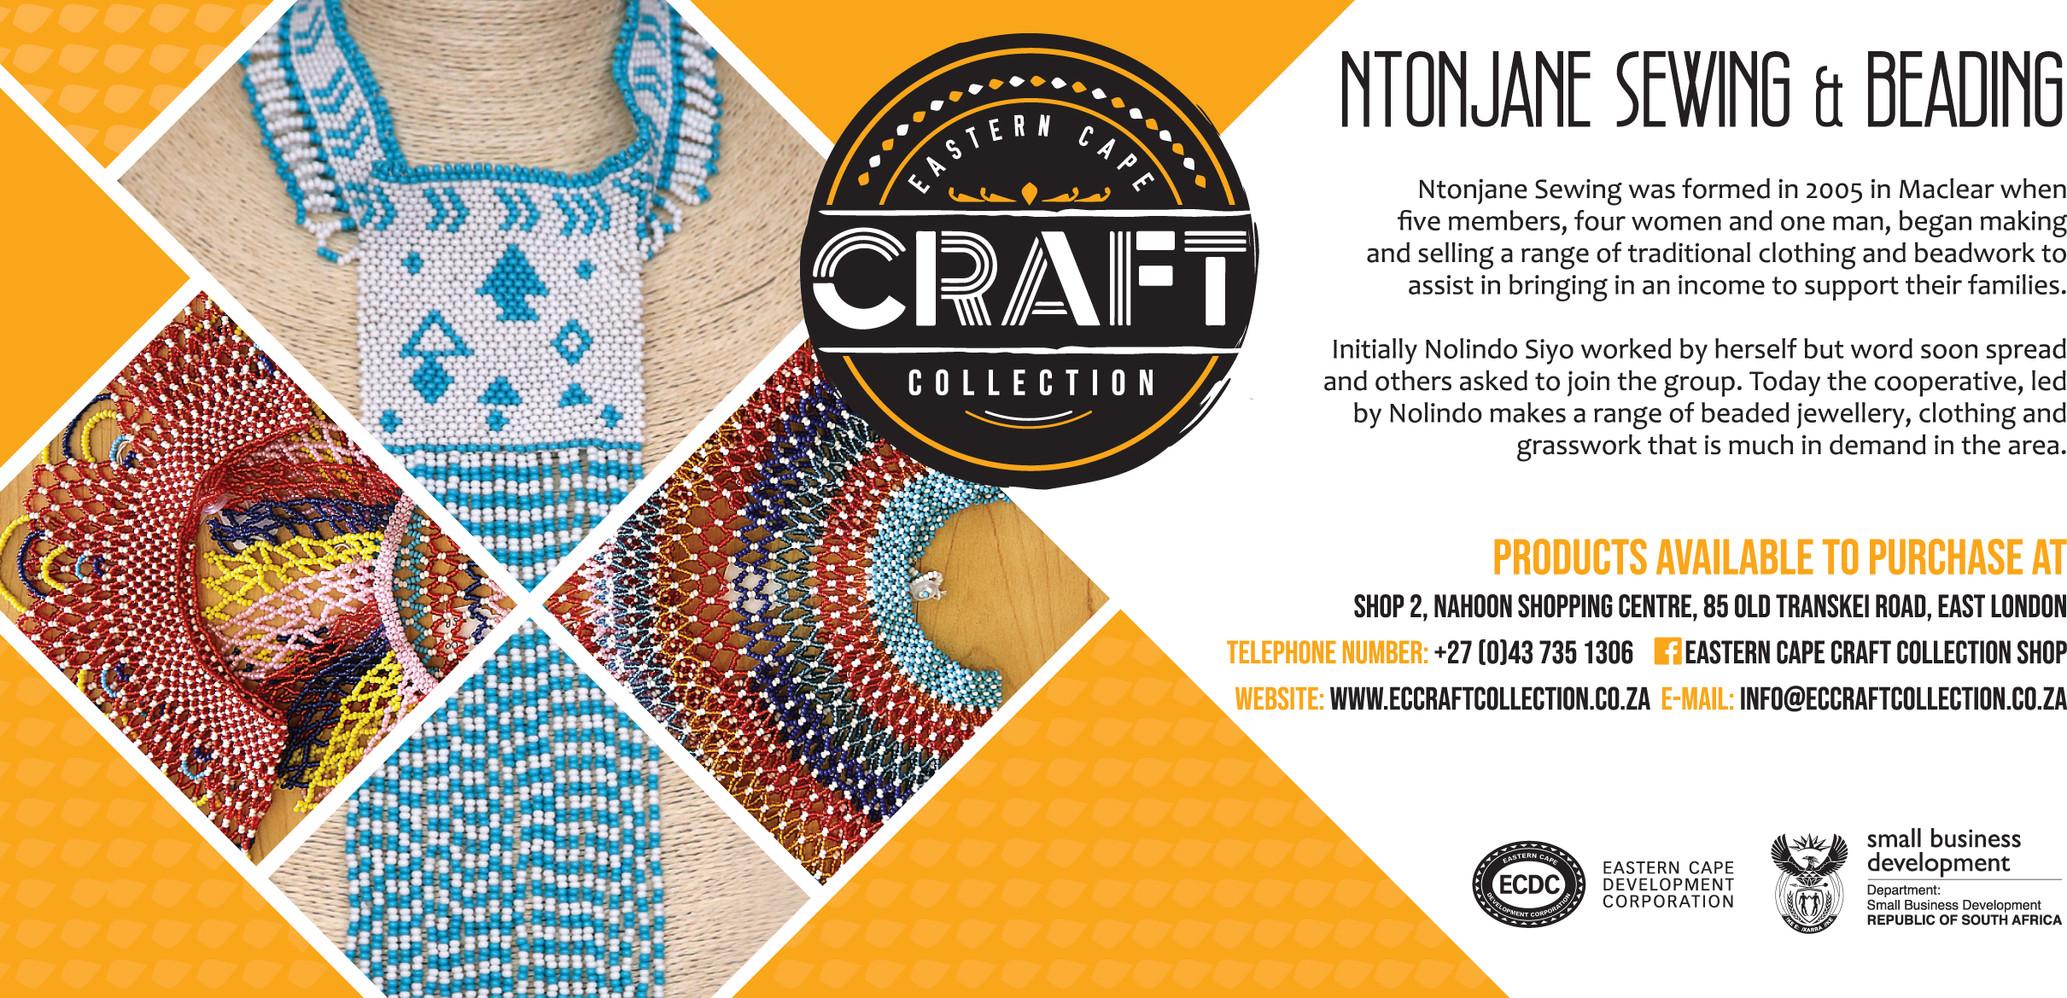 Ntonjane Sewing & Beading